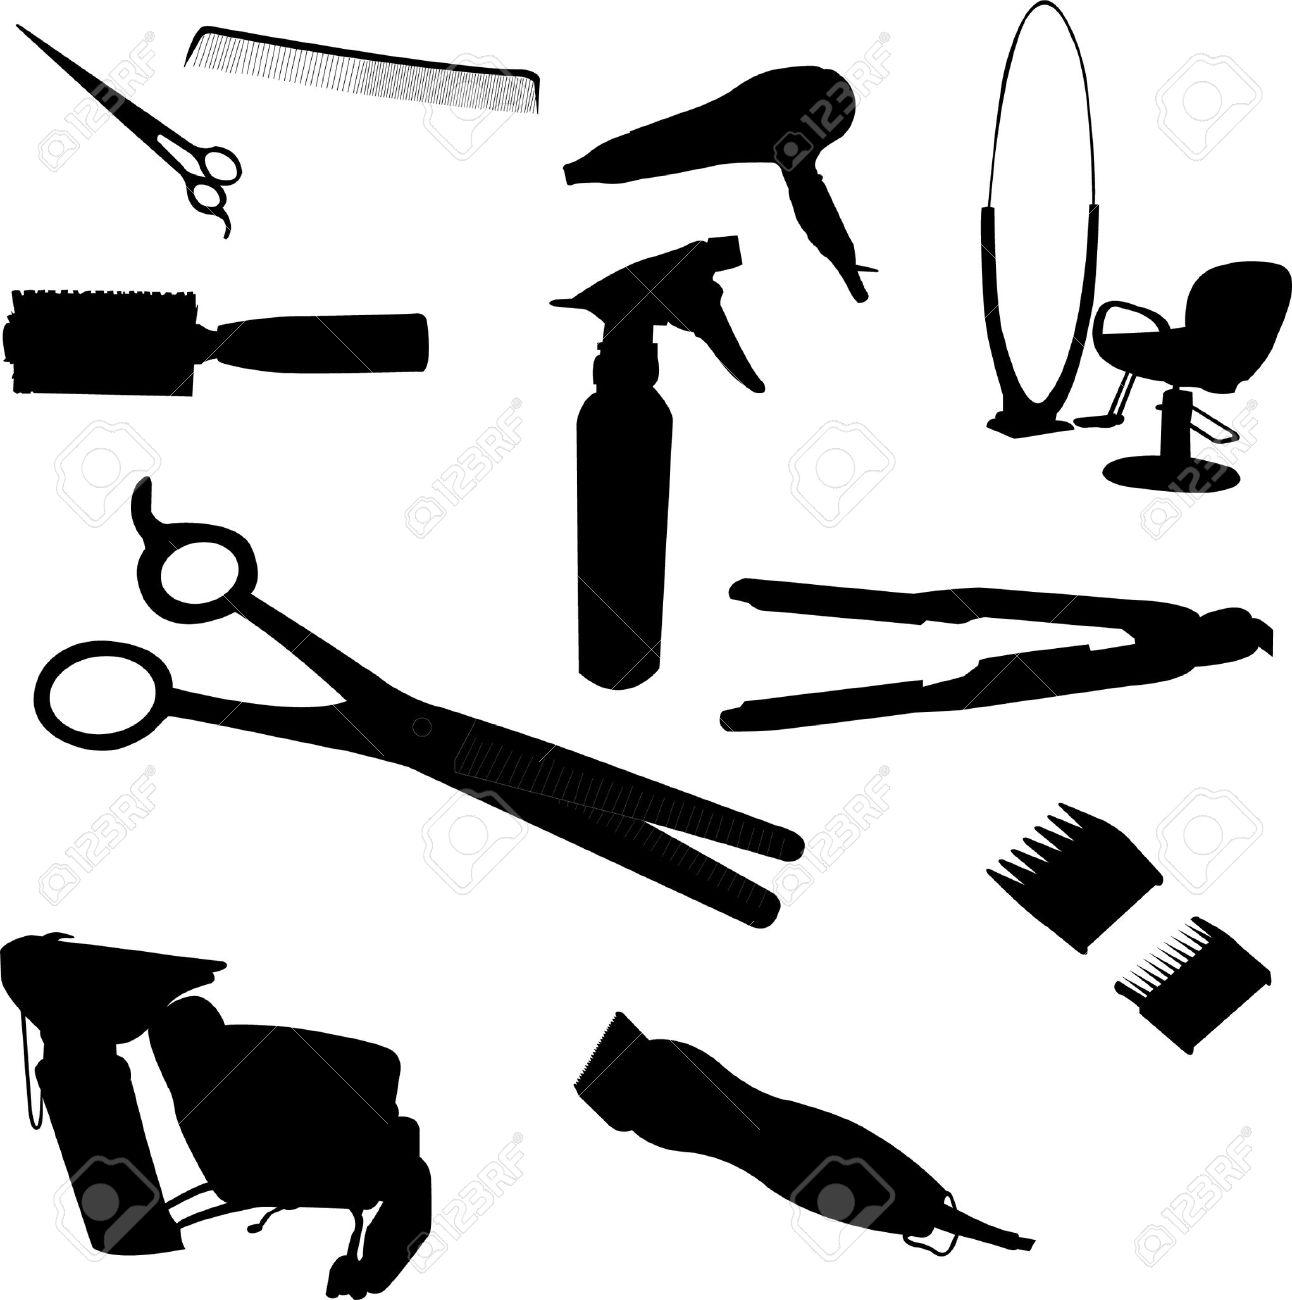 1292x1300 Black Hair Stylist Tools Clipart